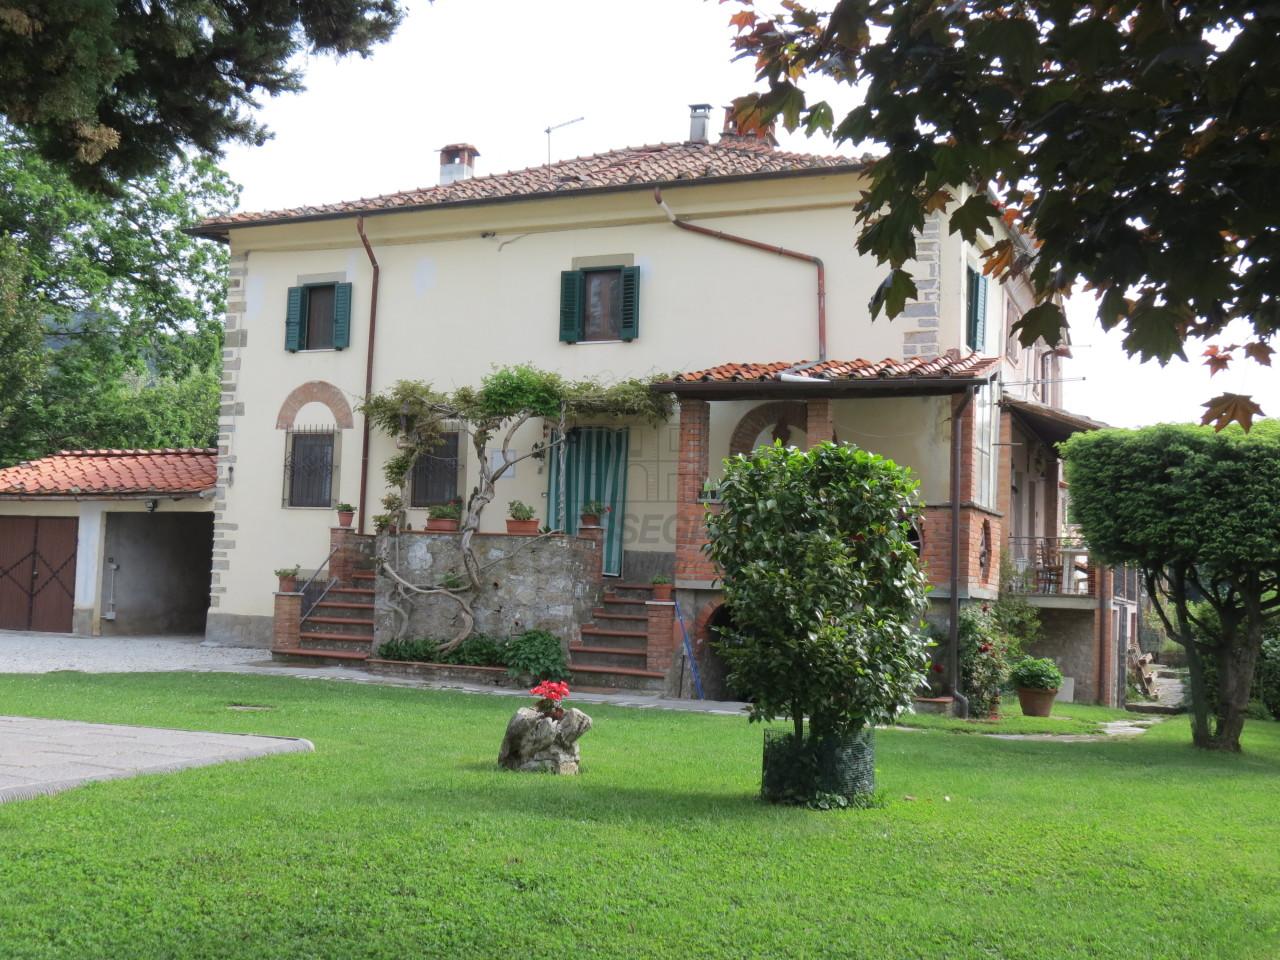 IA03133 Lucca